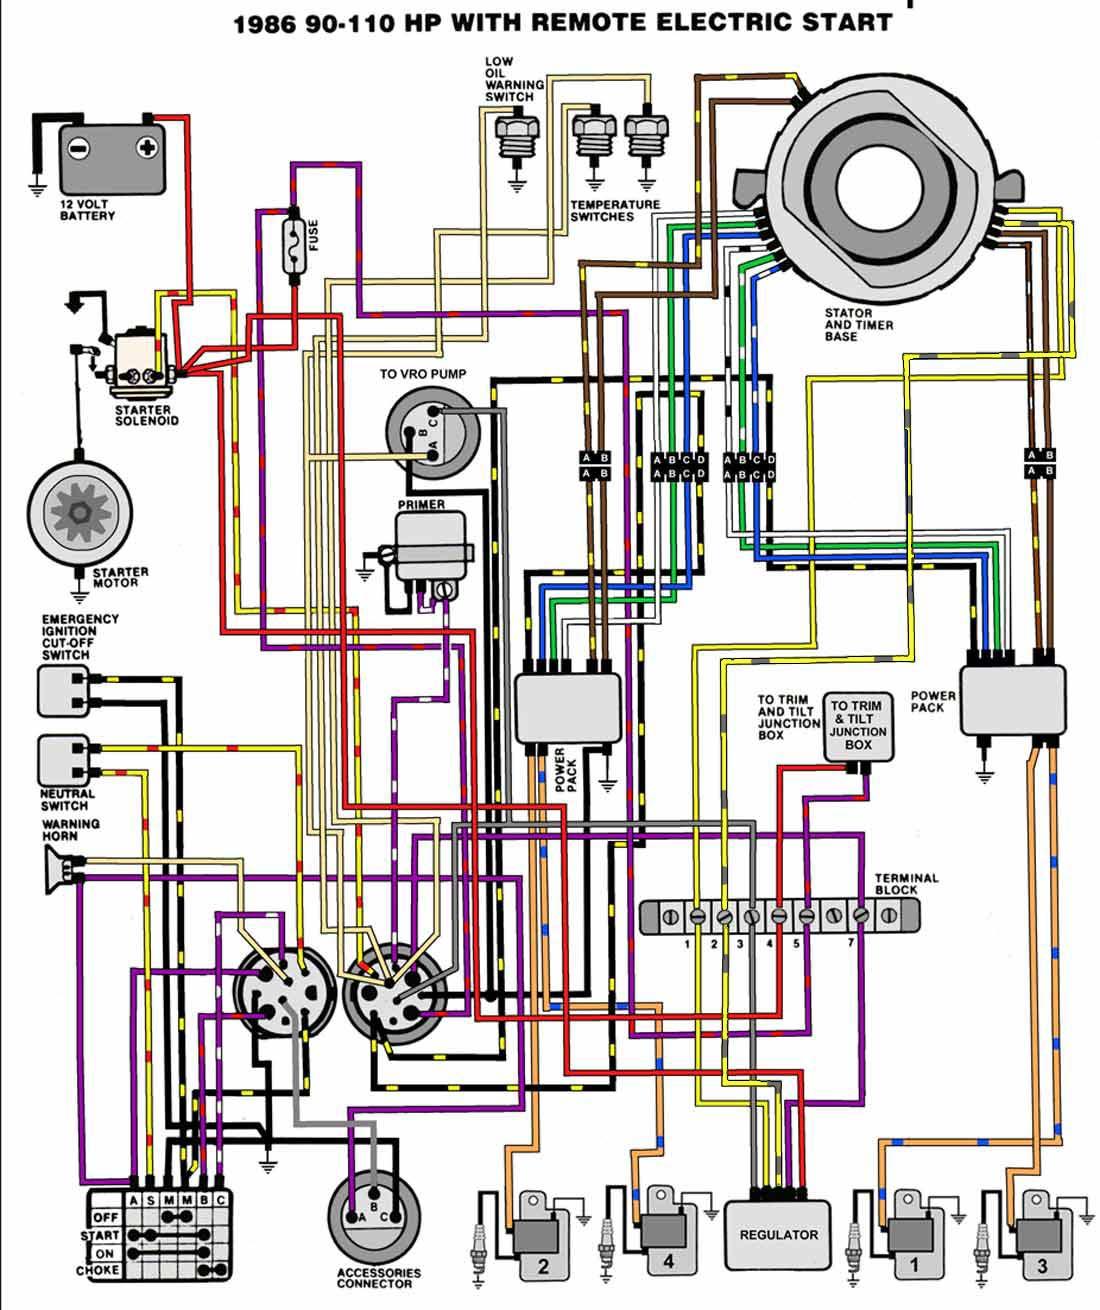 Honda 4 Stroke Outboard Diagrams Bf60 Wiring Diagram